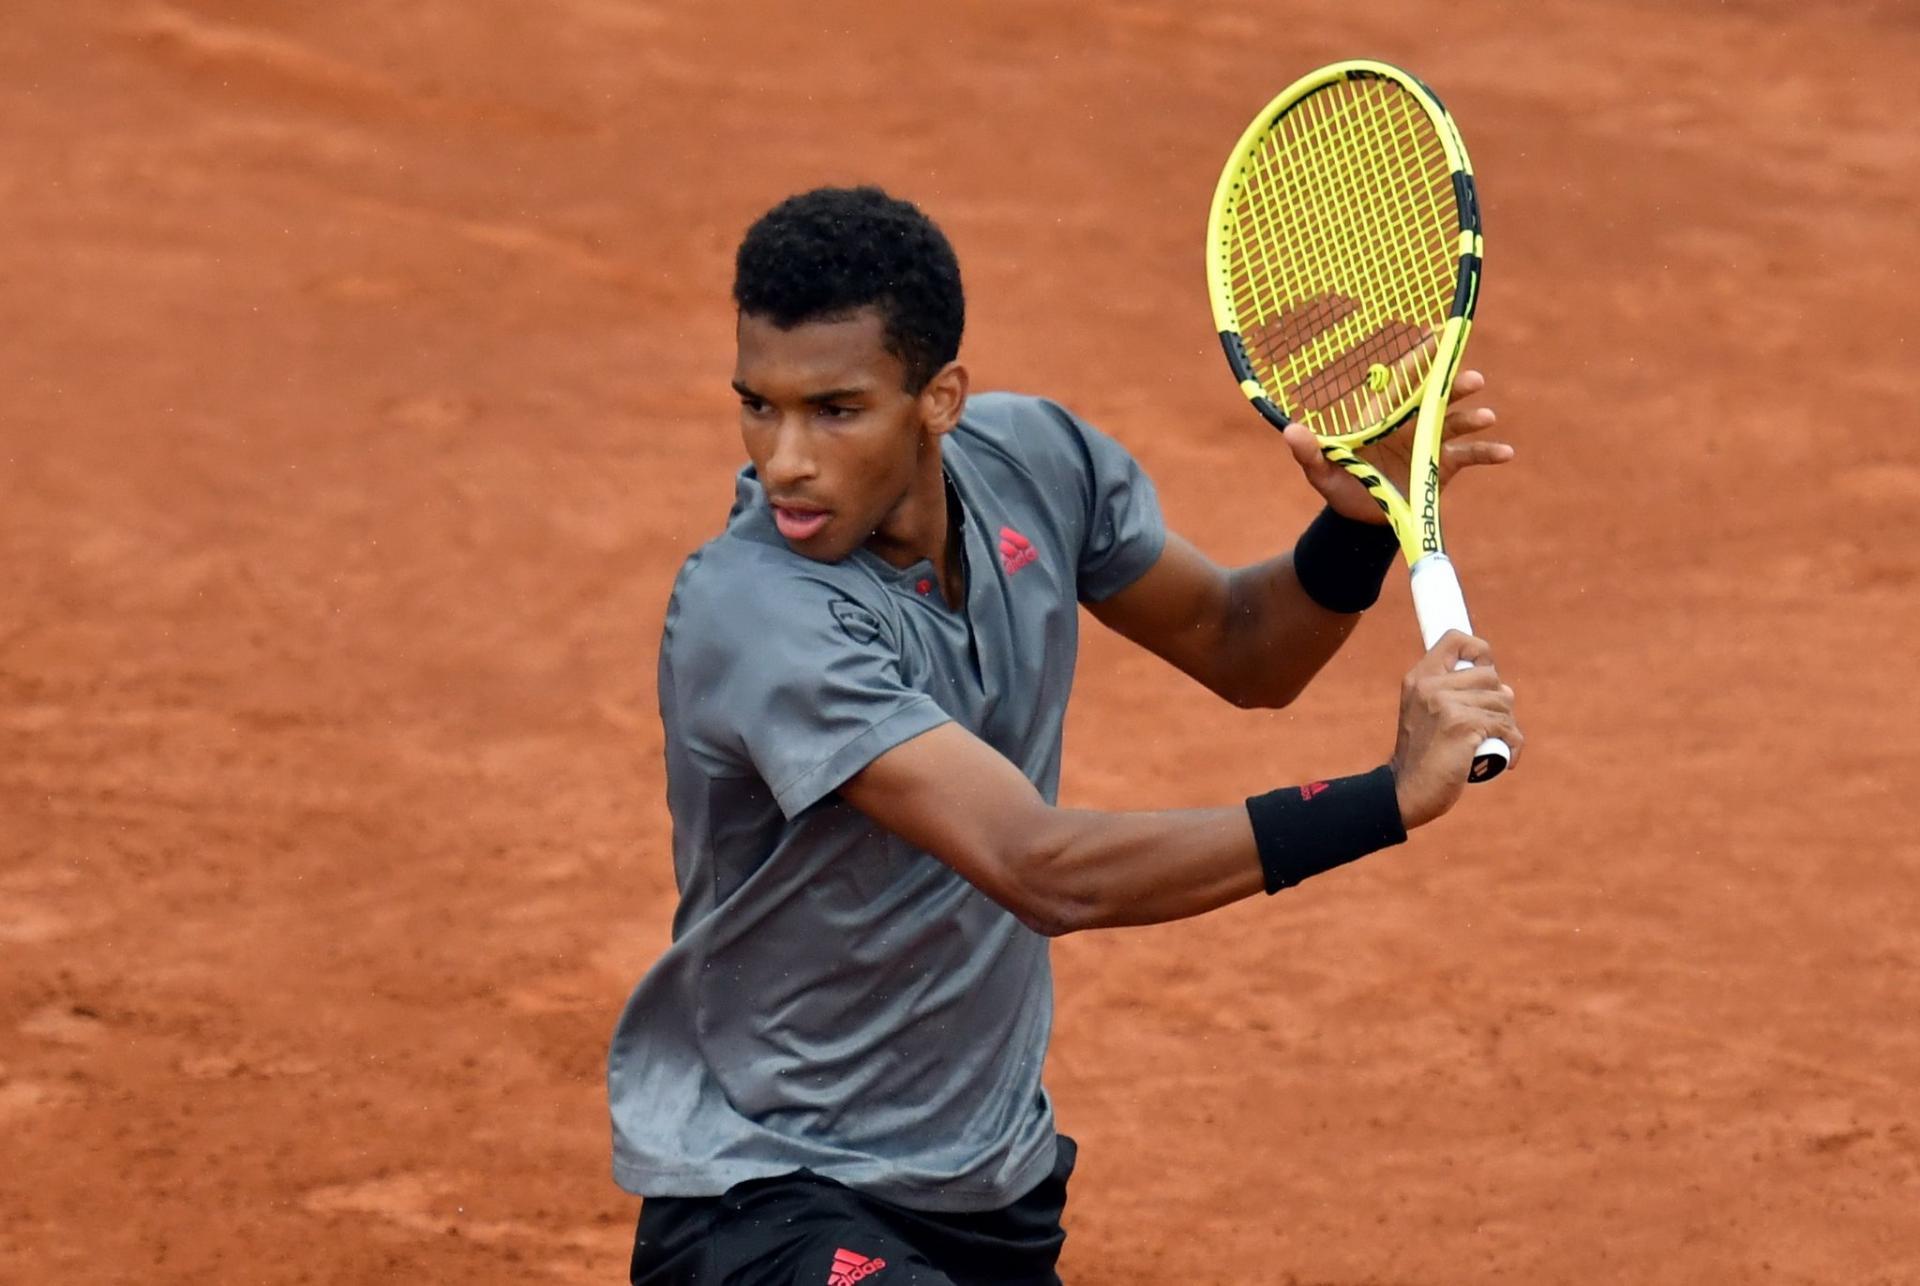 Rome Open 2021: Felix Auger-Aliassime vs. Federico Delbonis Tennis Pick and Prediction